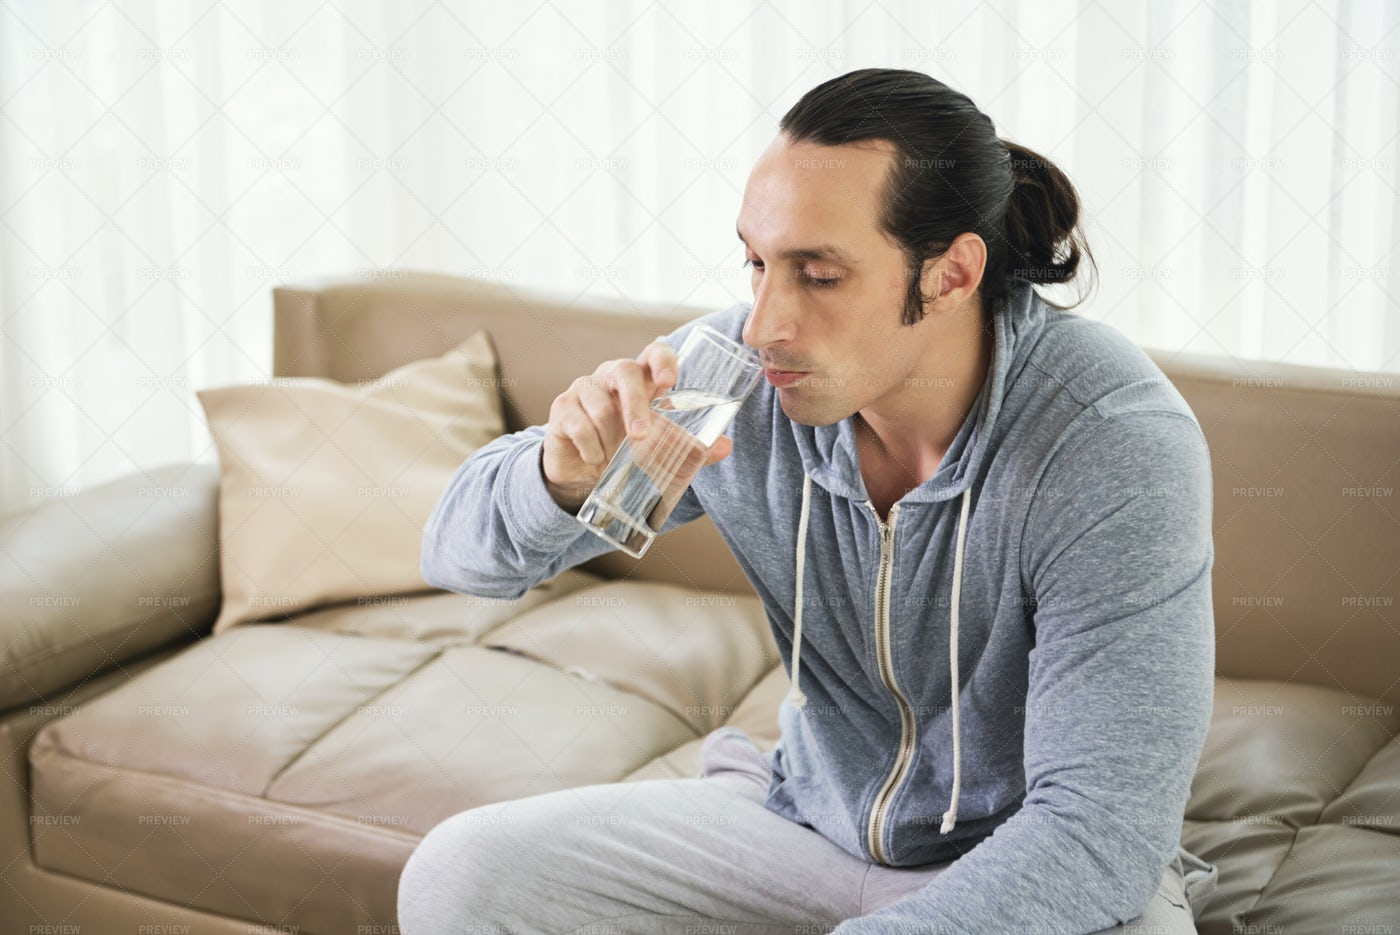 Man Drinking Water: Stock Photos